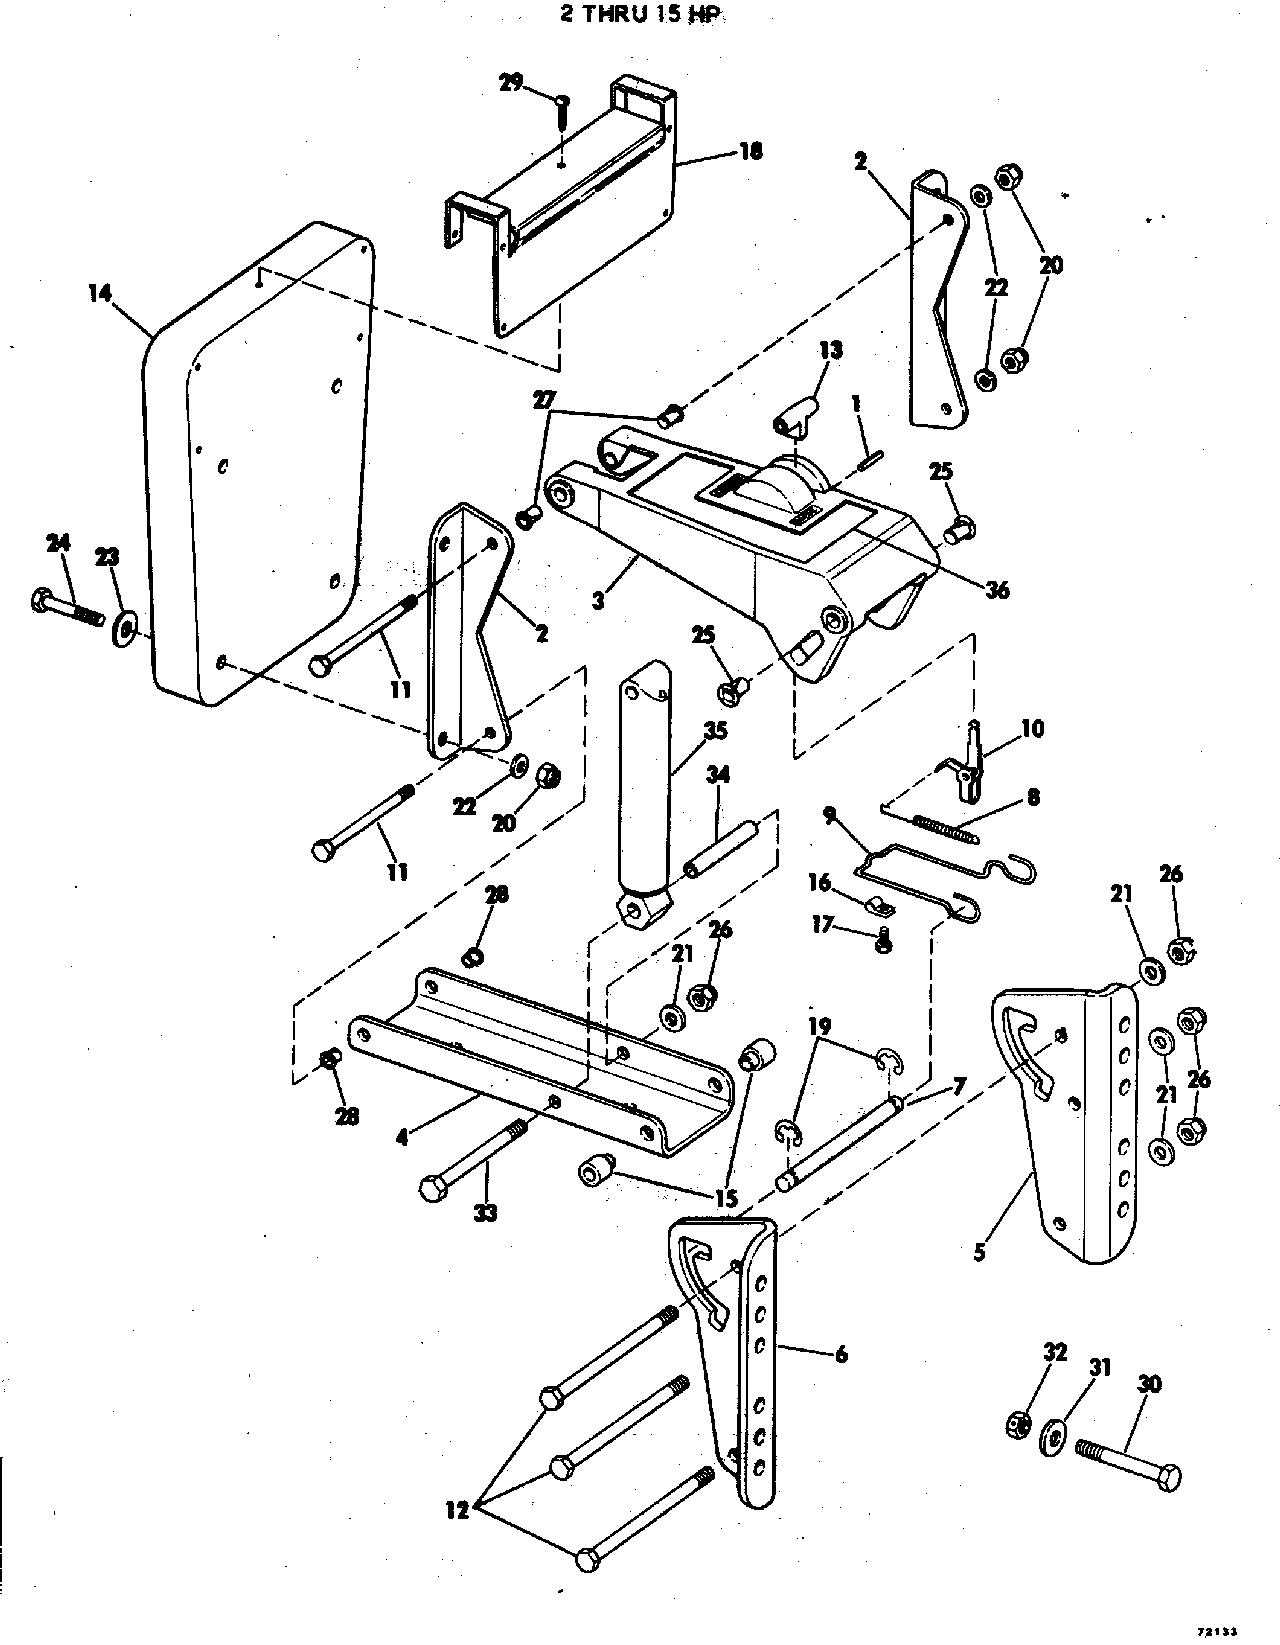 Auxiliary Motor Bracket Kit 2 Thru 15 Hp Miscellaneous